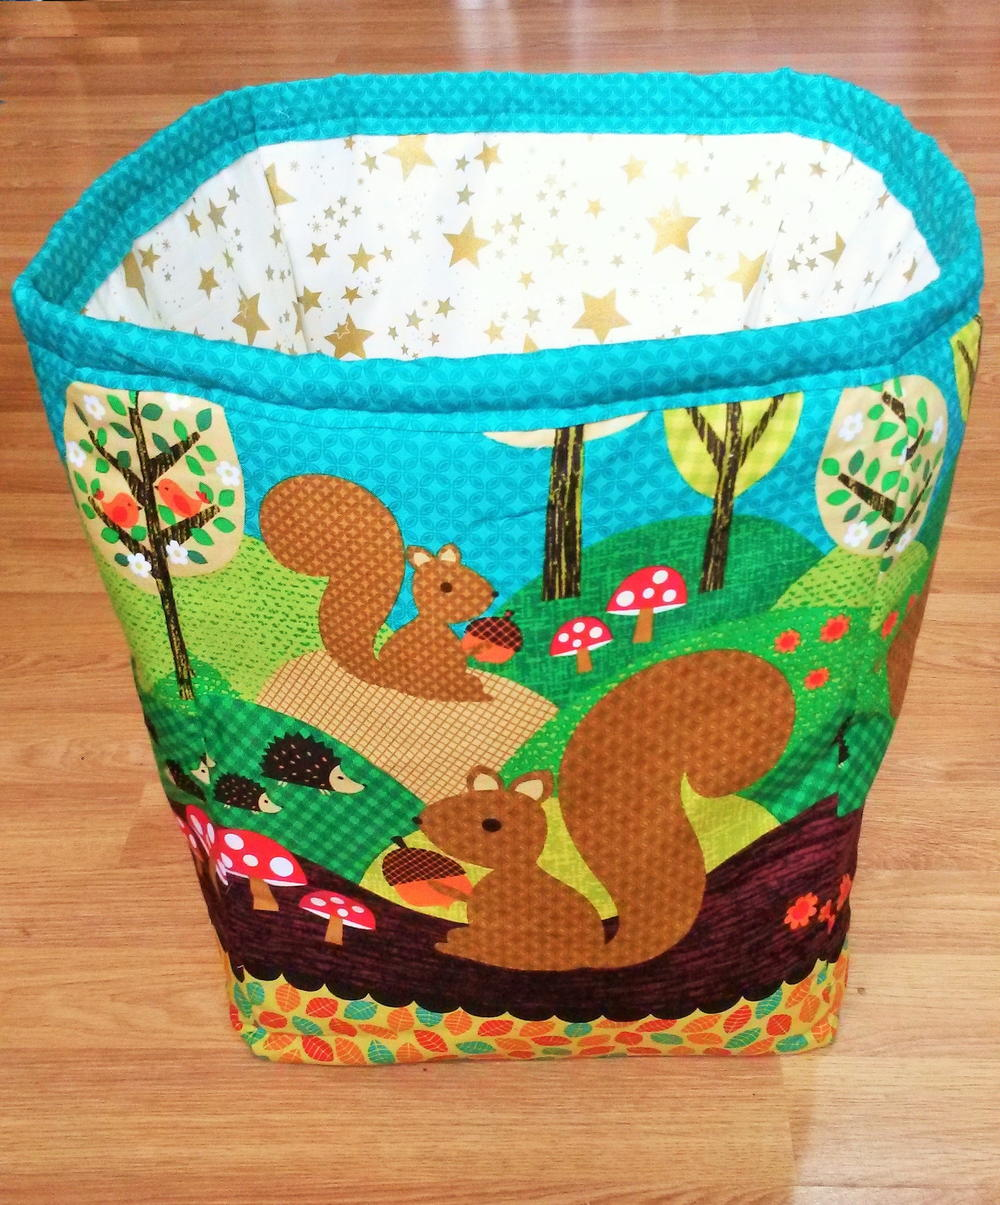 Fabric DIY Laundry Basket